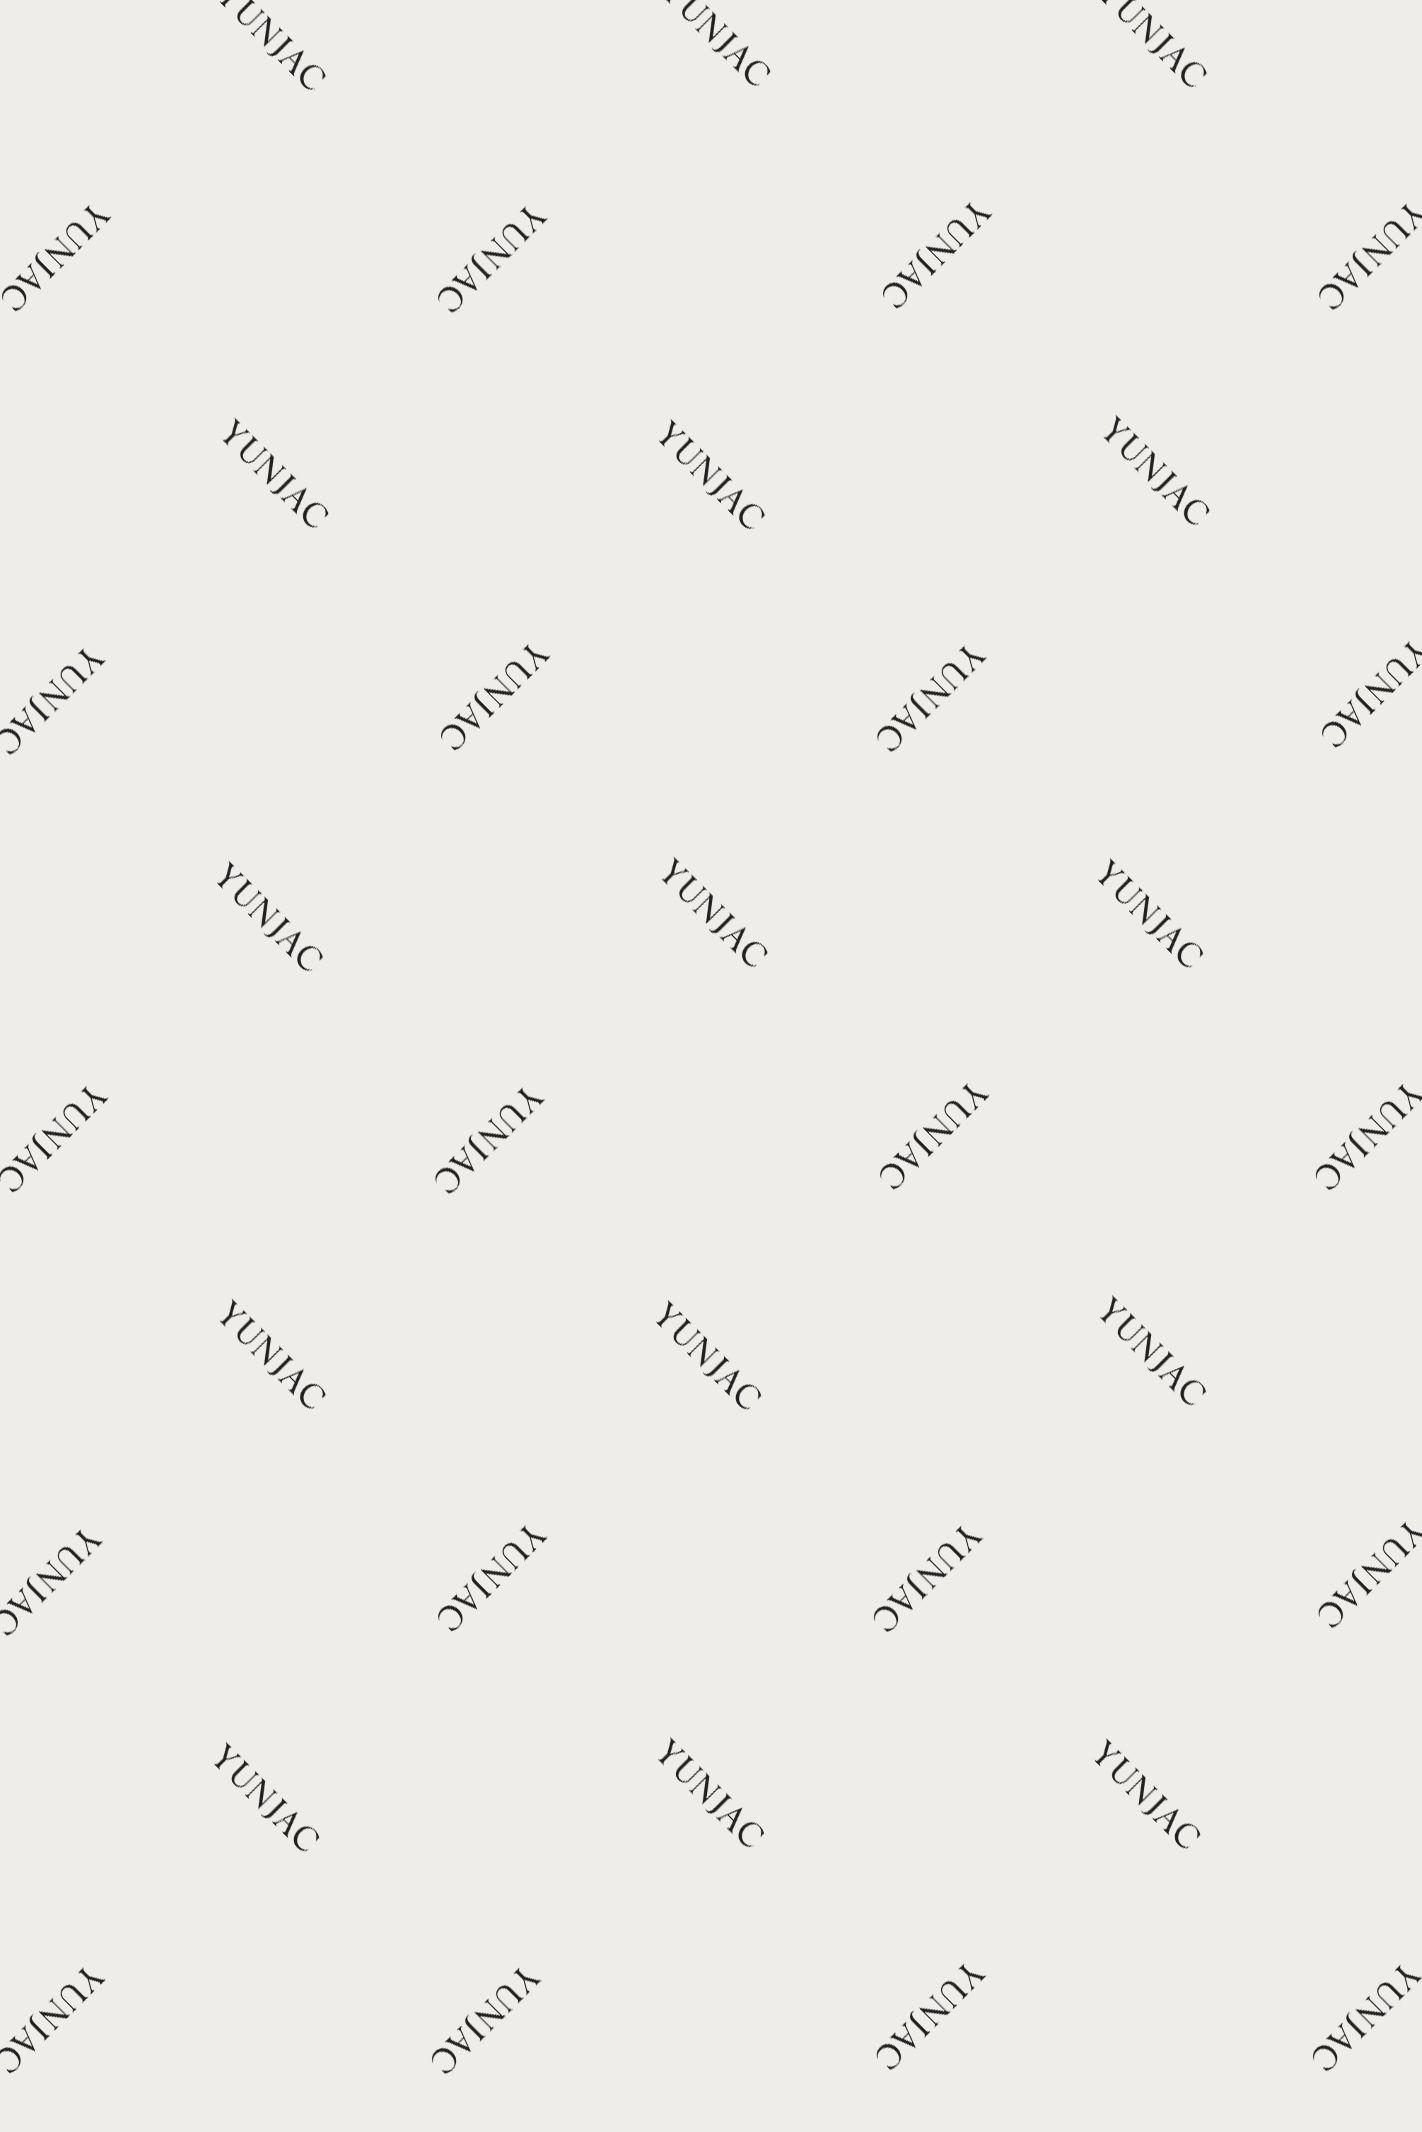 Yunjac pattern design